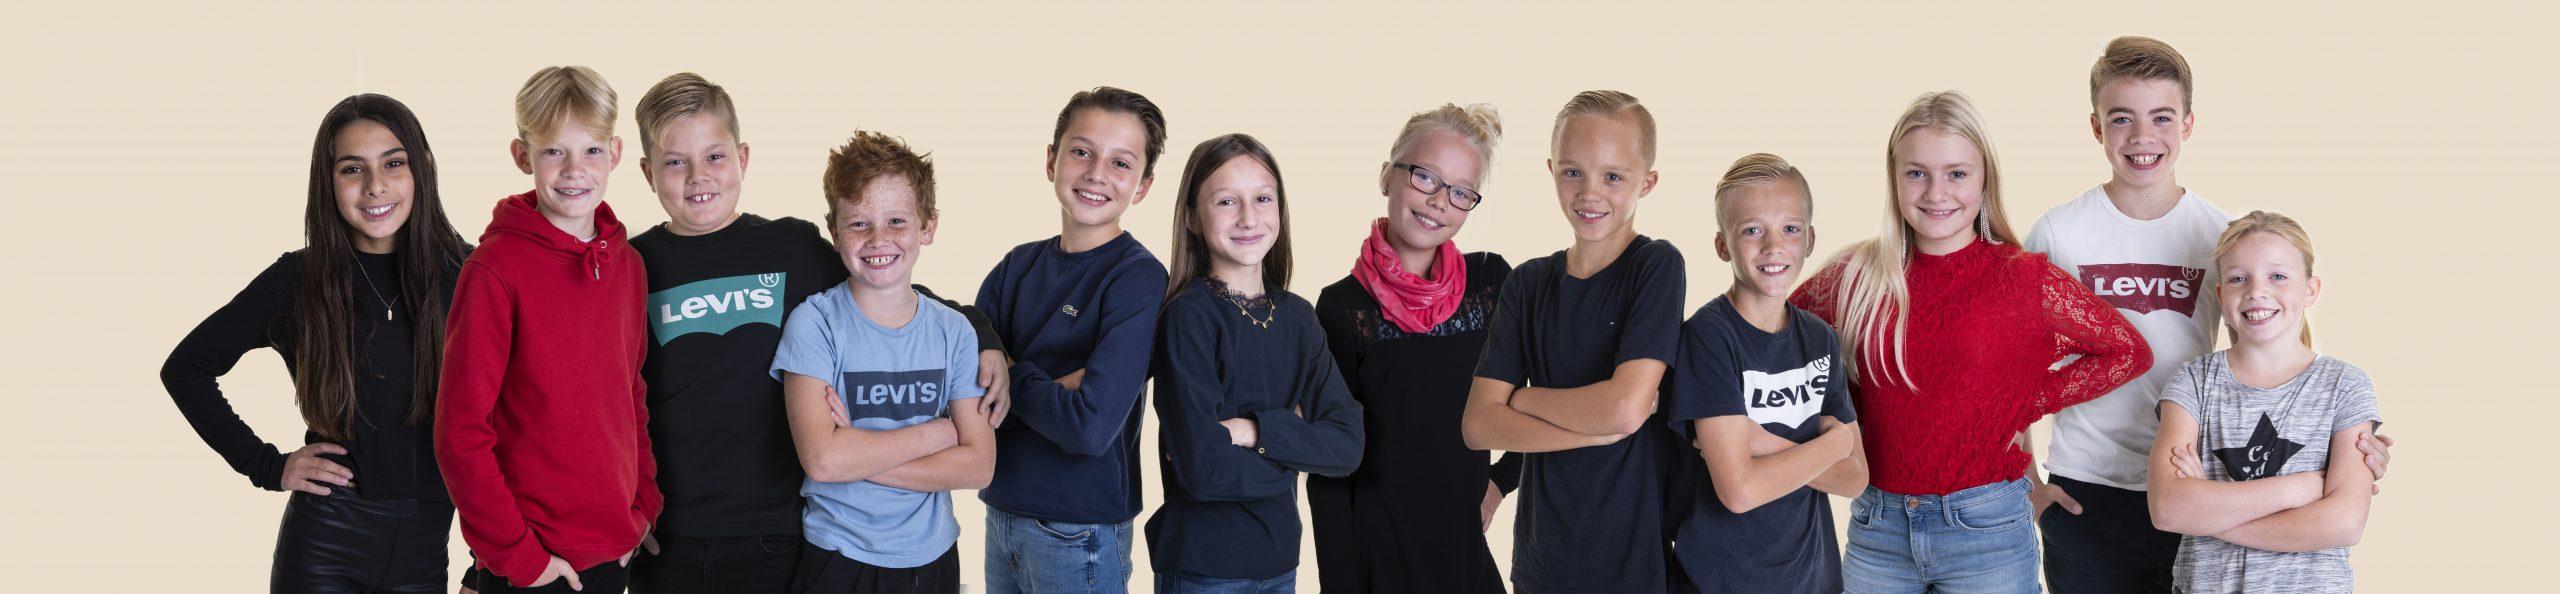 Klassebilledet til skolefotografering